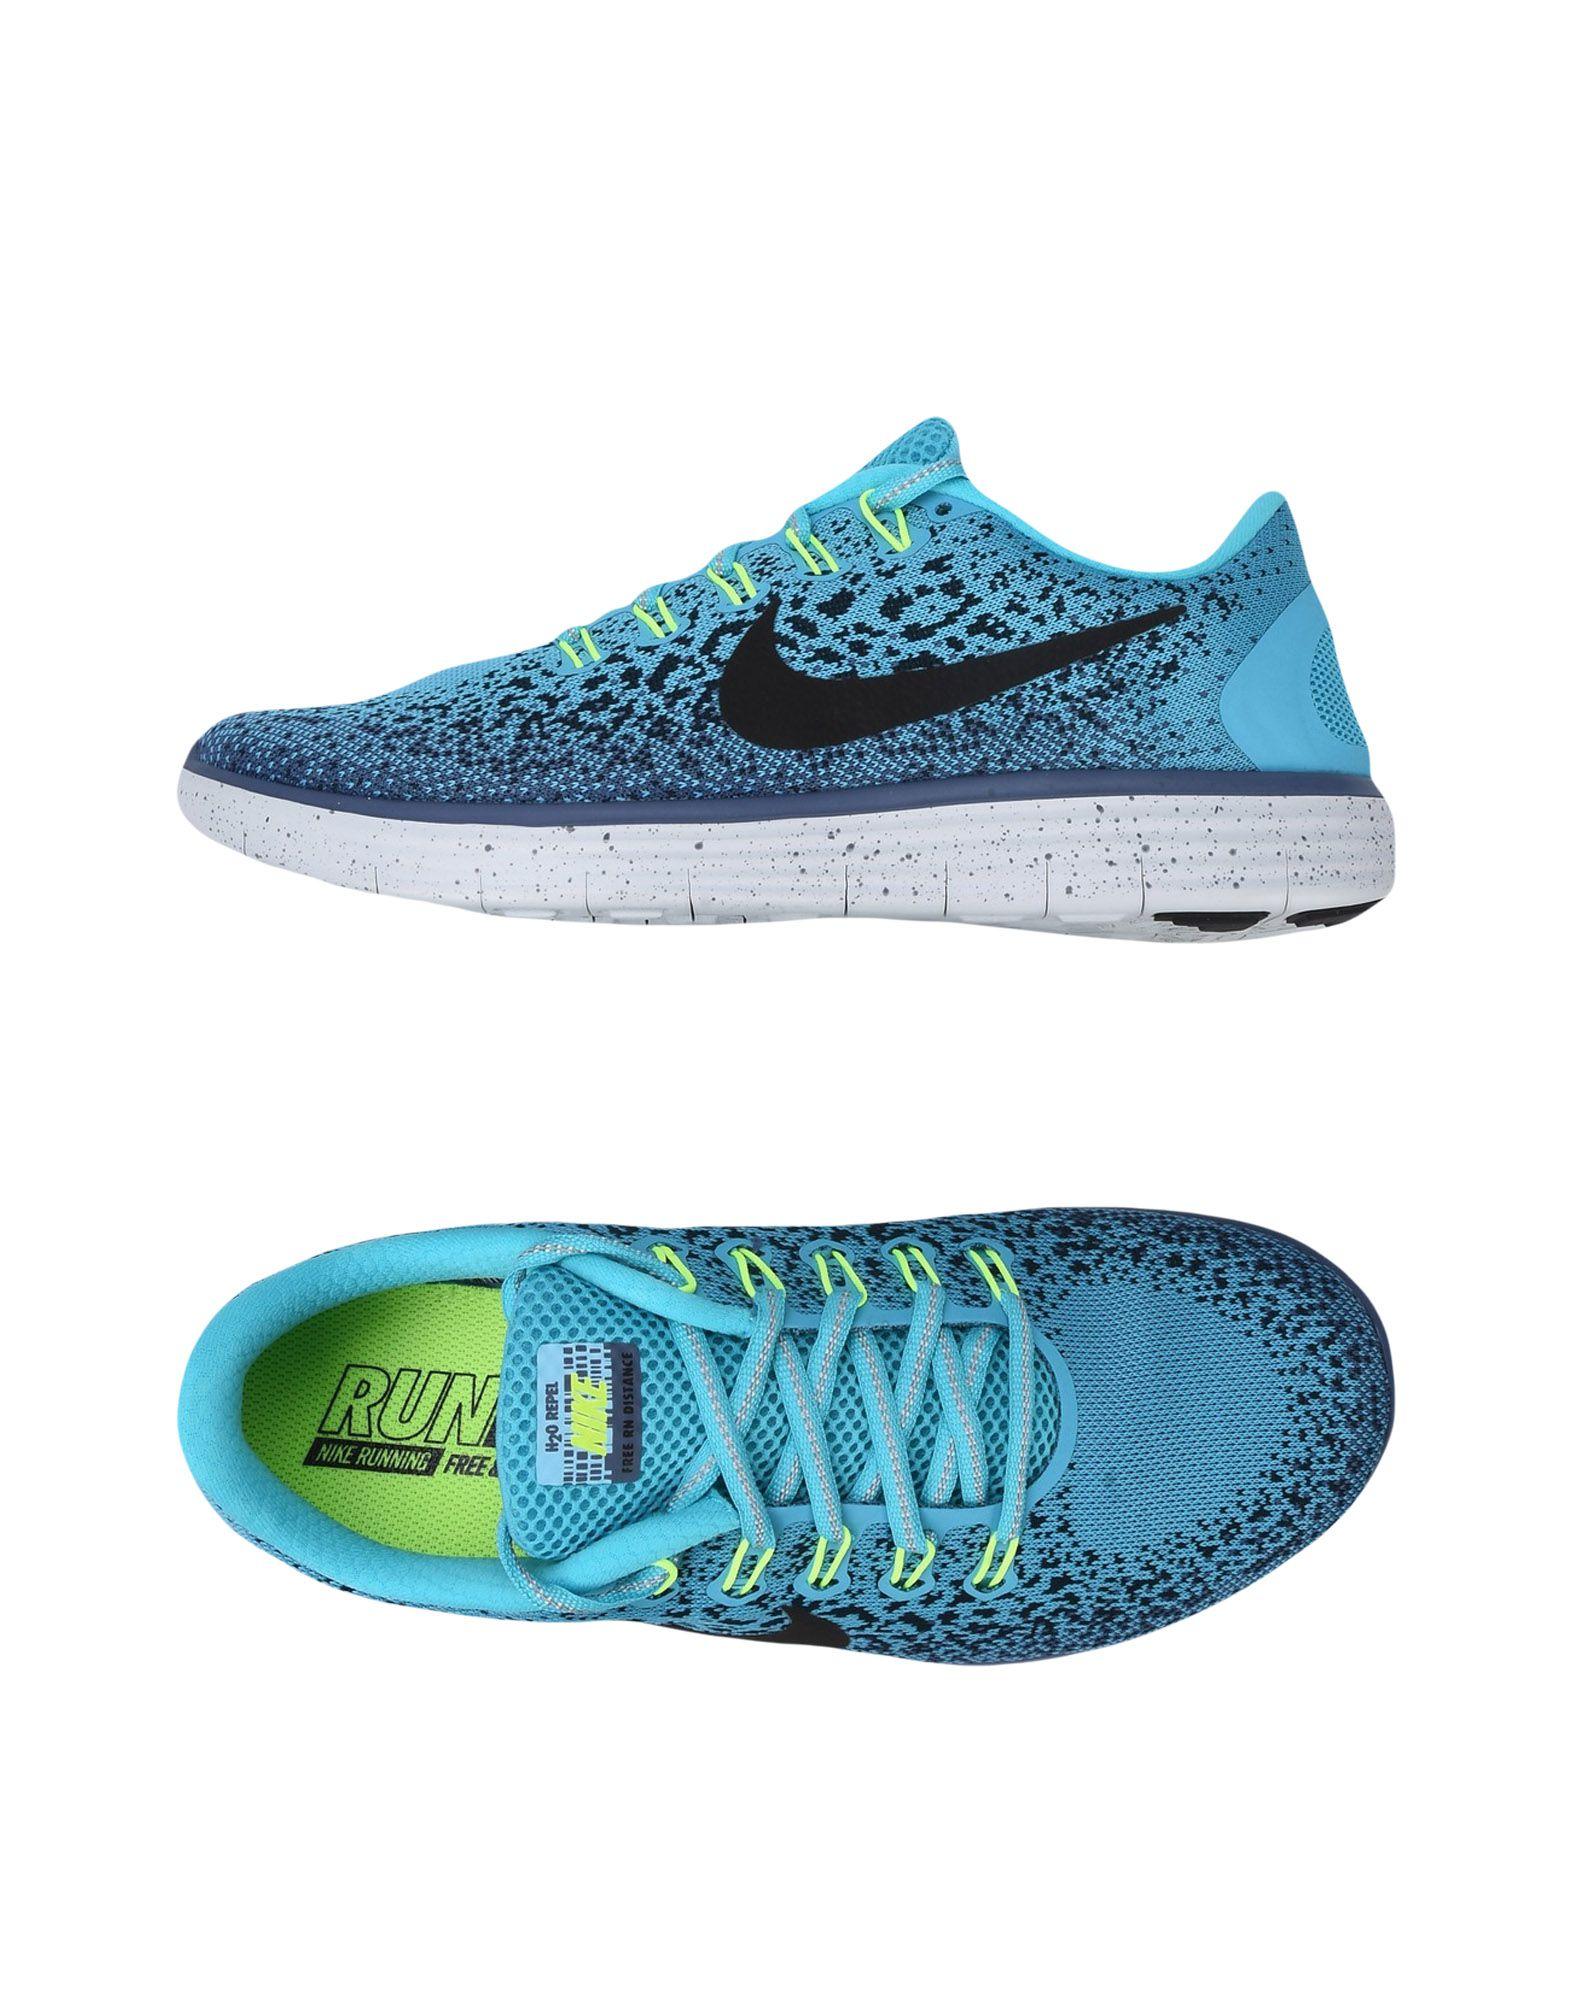 Nike   Free Run Distance Shield  11218859JX Gute Qualität beliebte Schuhe